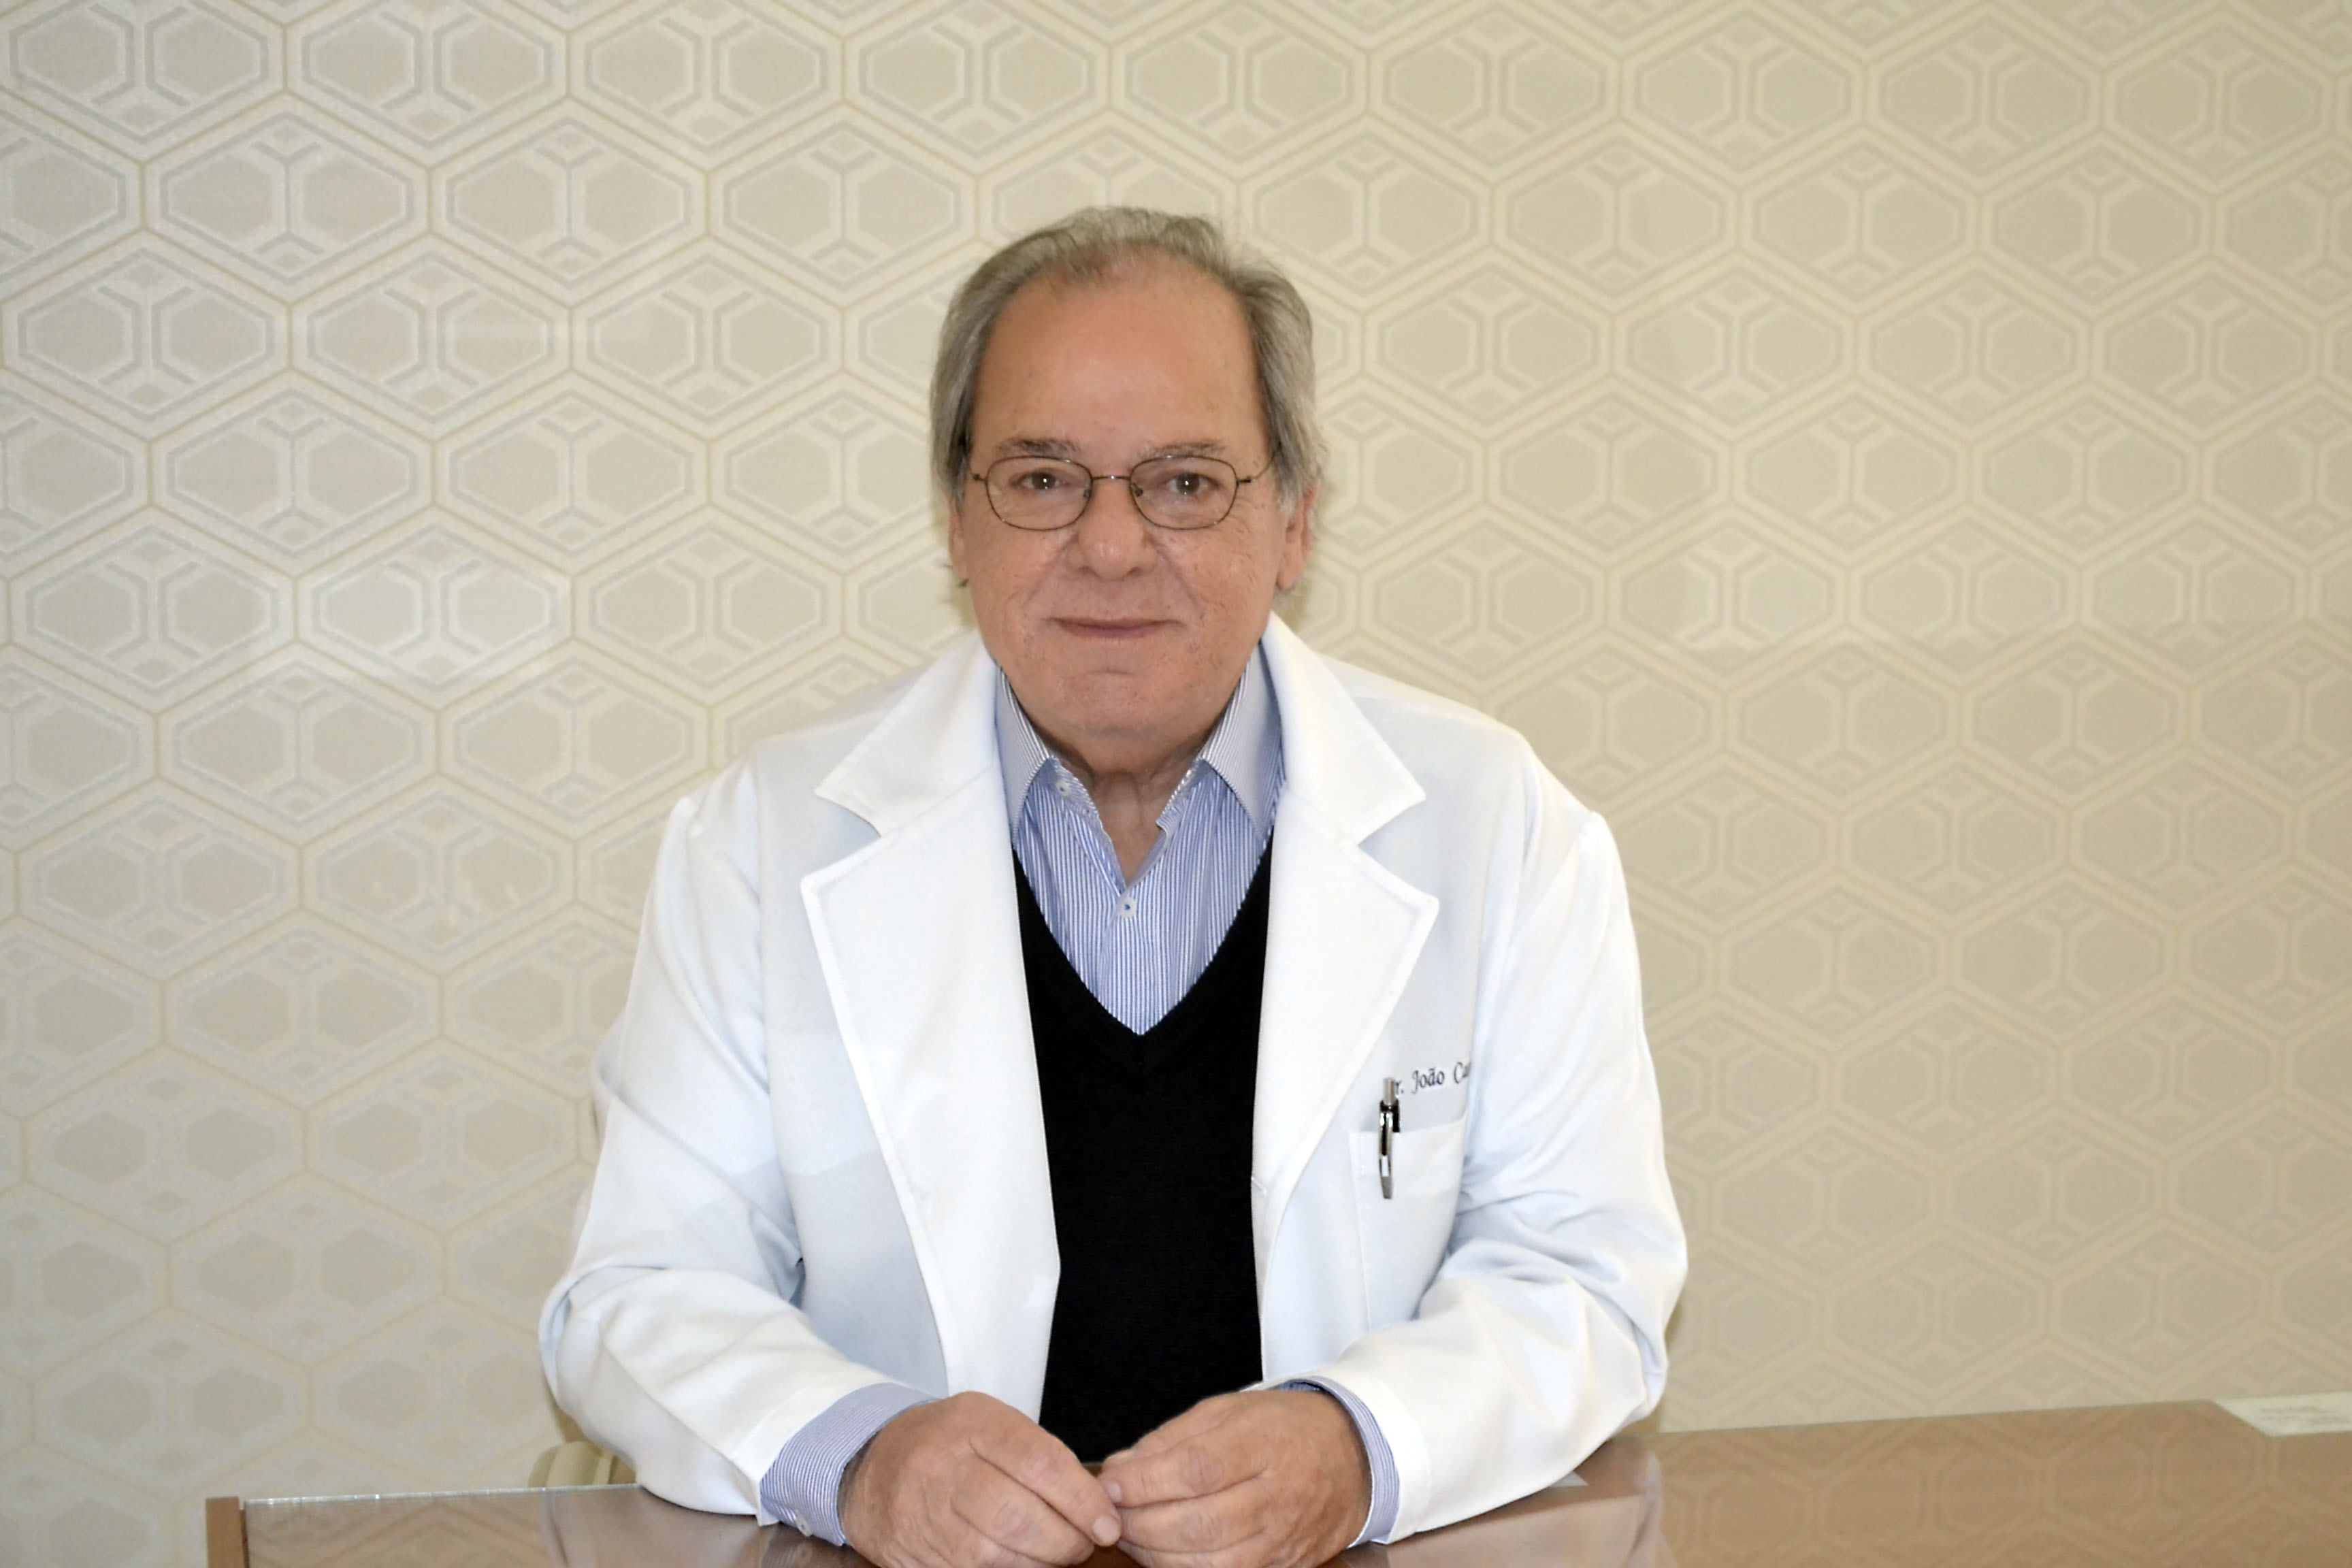 Drº João Carone Junior – Gastroenterologia/Proctologia - CRM: 27691